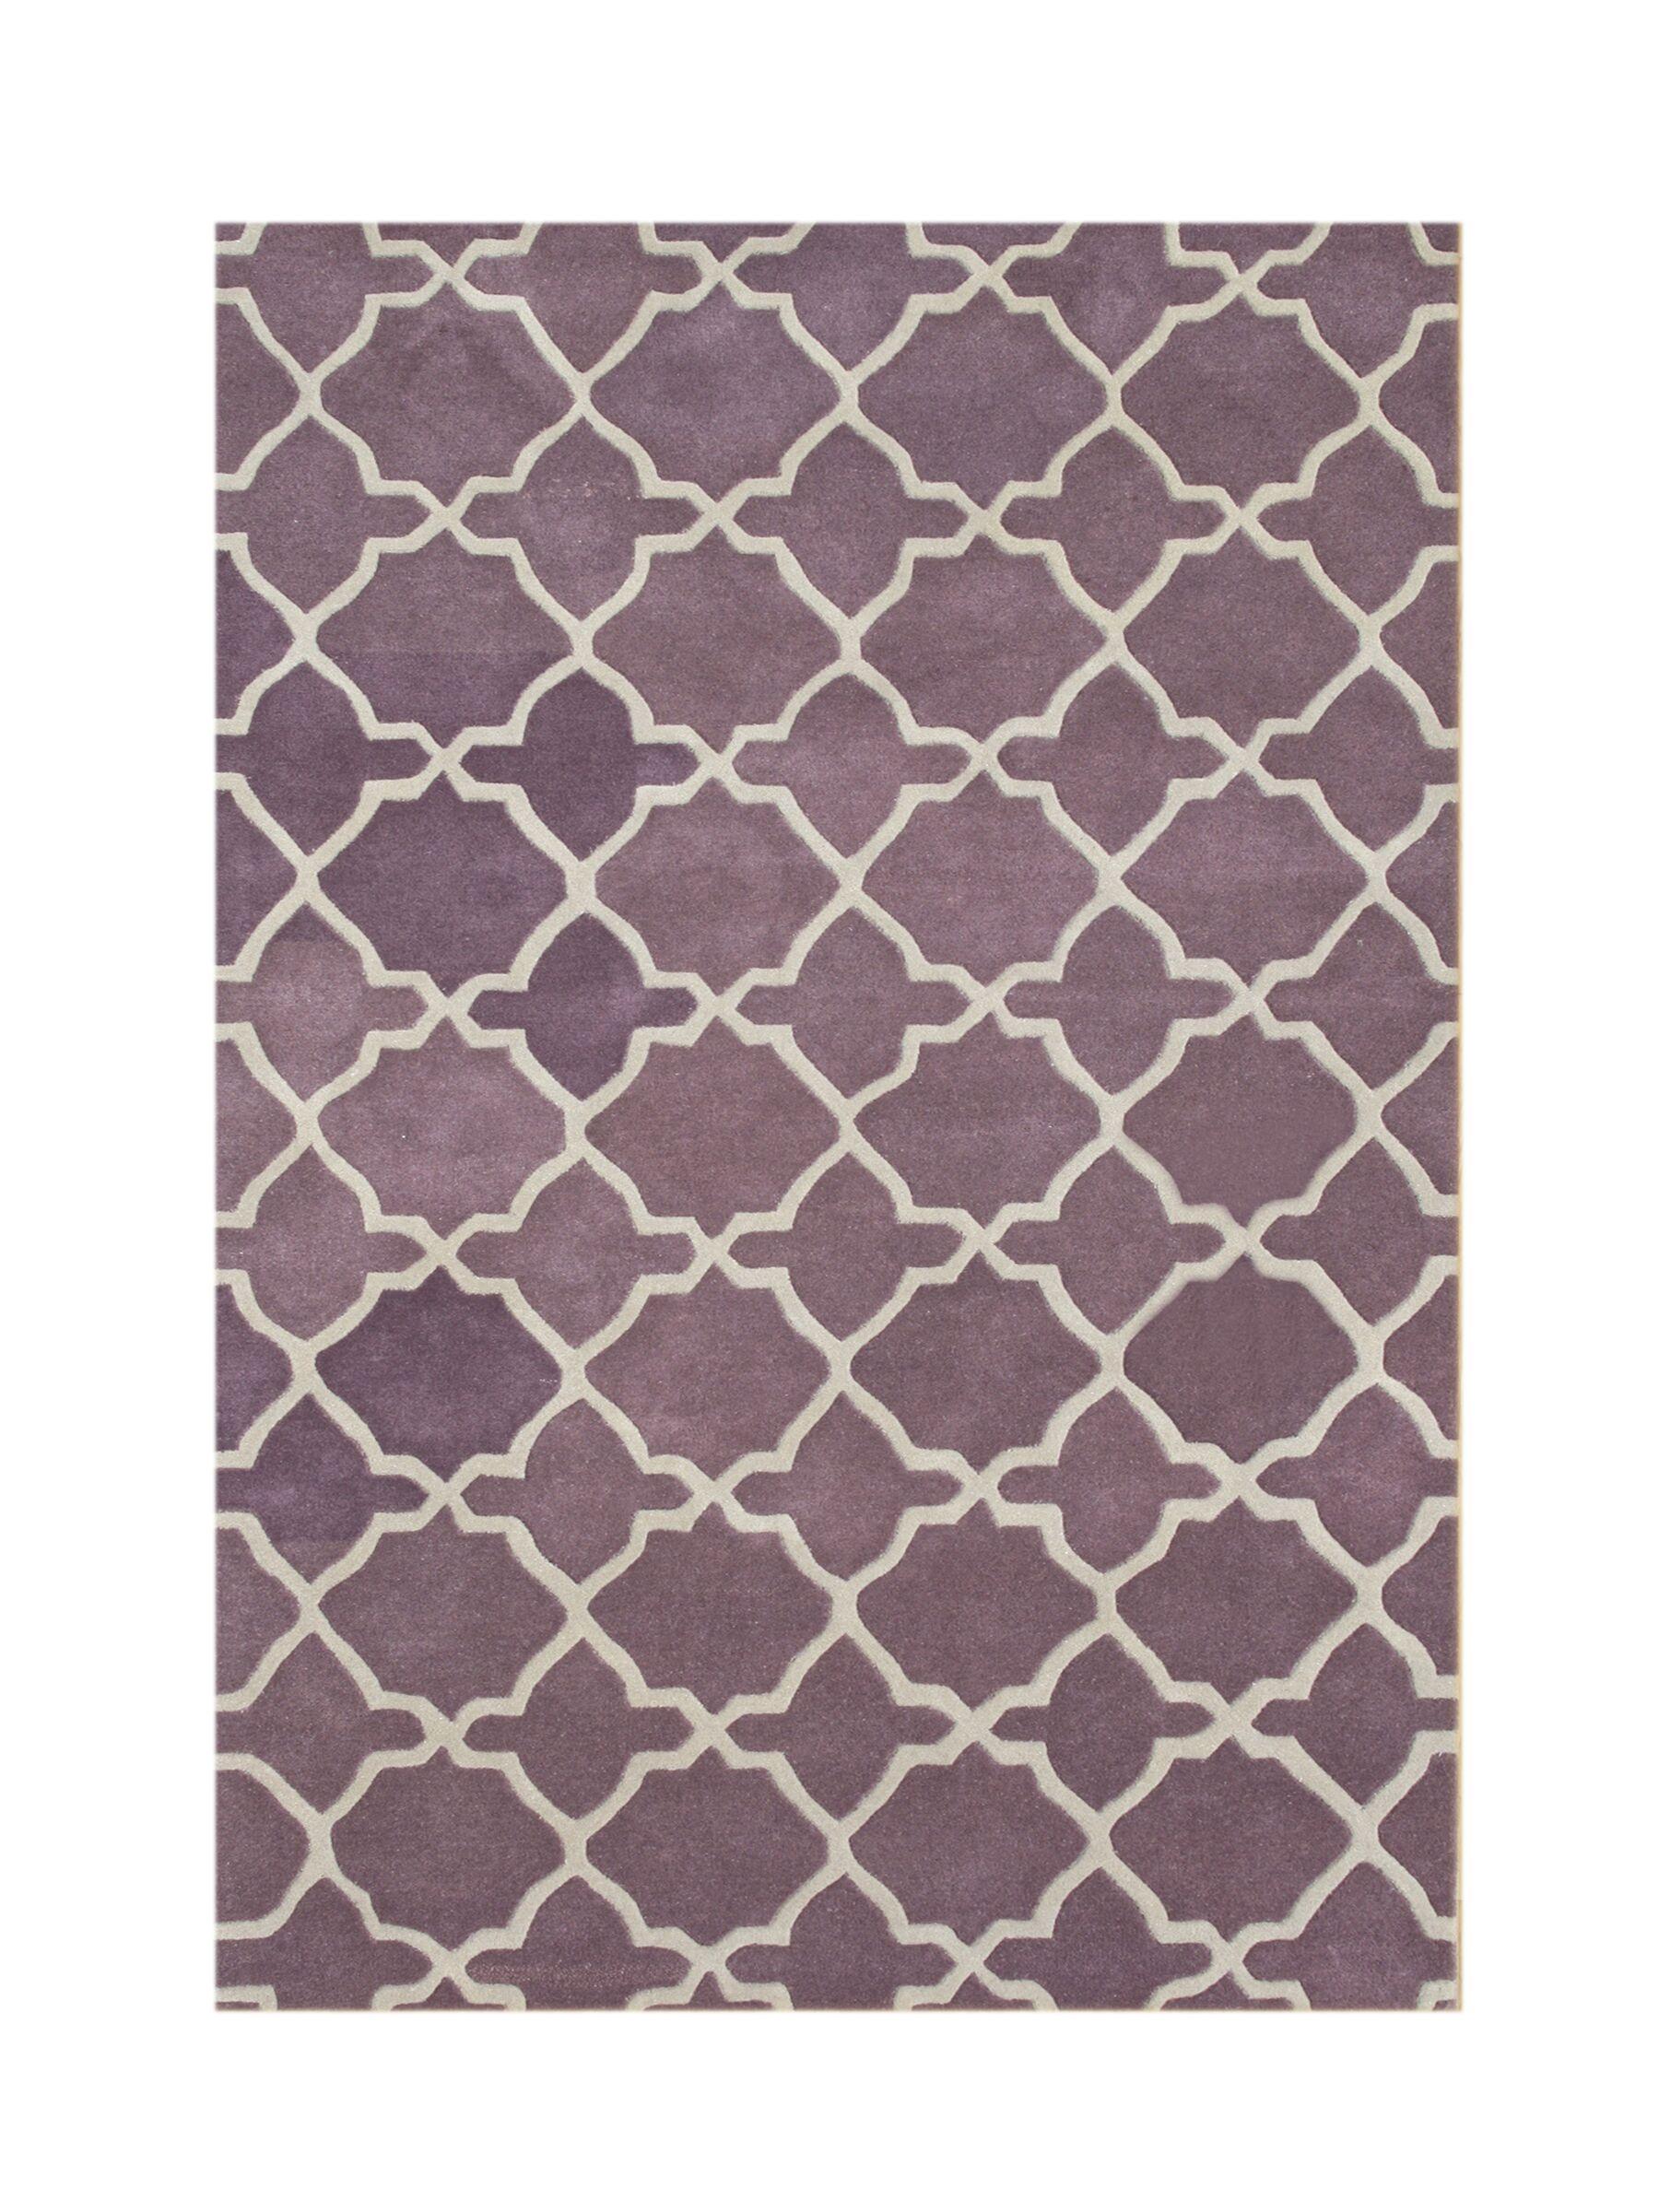 Wauna Hand-Tufted Purple/White Area Rug Rug Size: Rectangle 8' x 10'